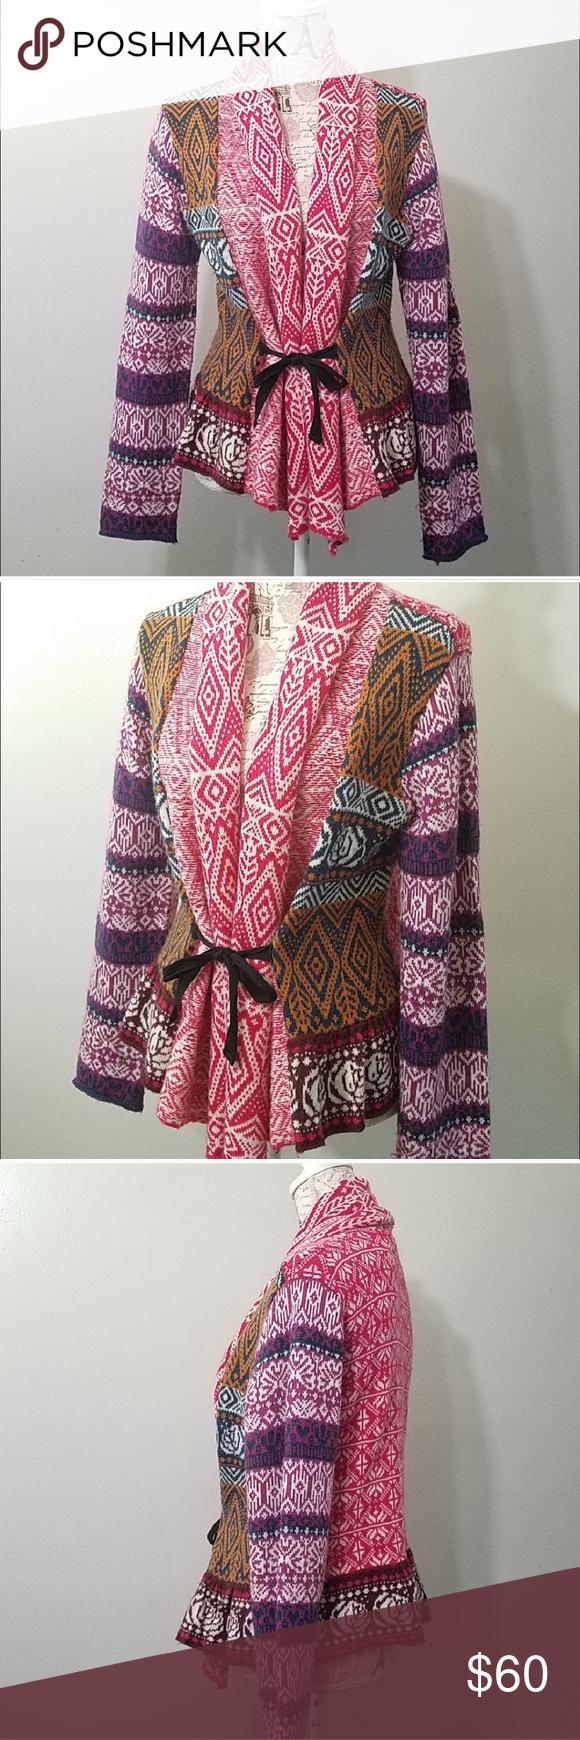 Sundance Storyline Cardigan Clothes Design Fashion Design Cardigan